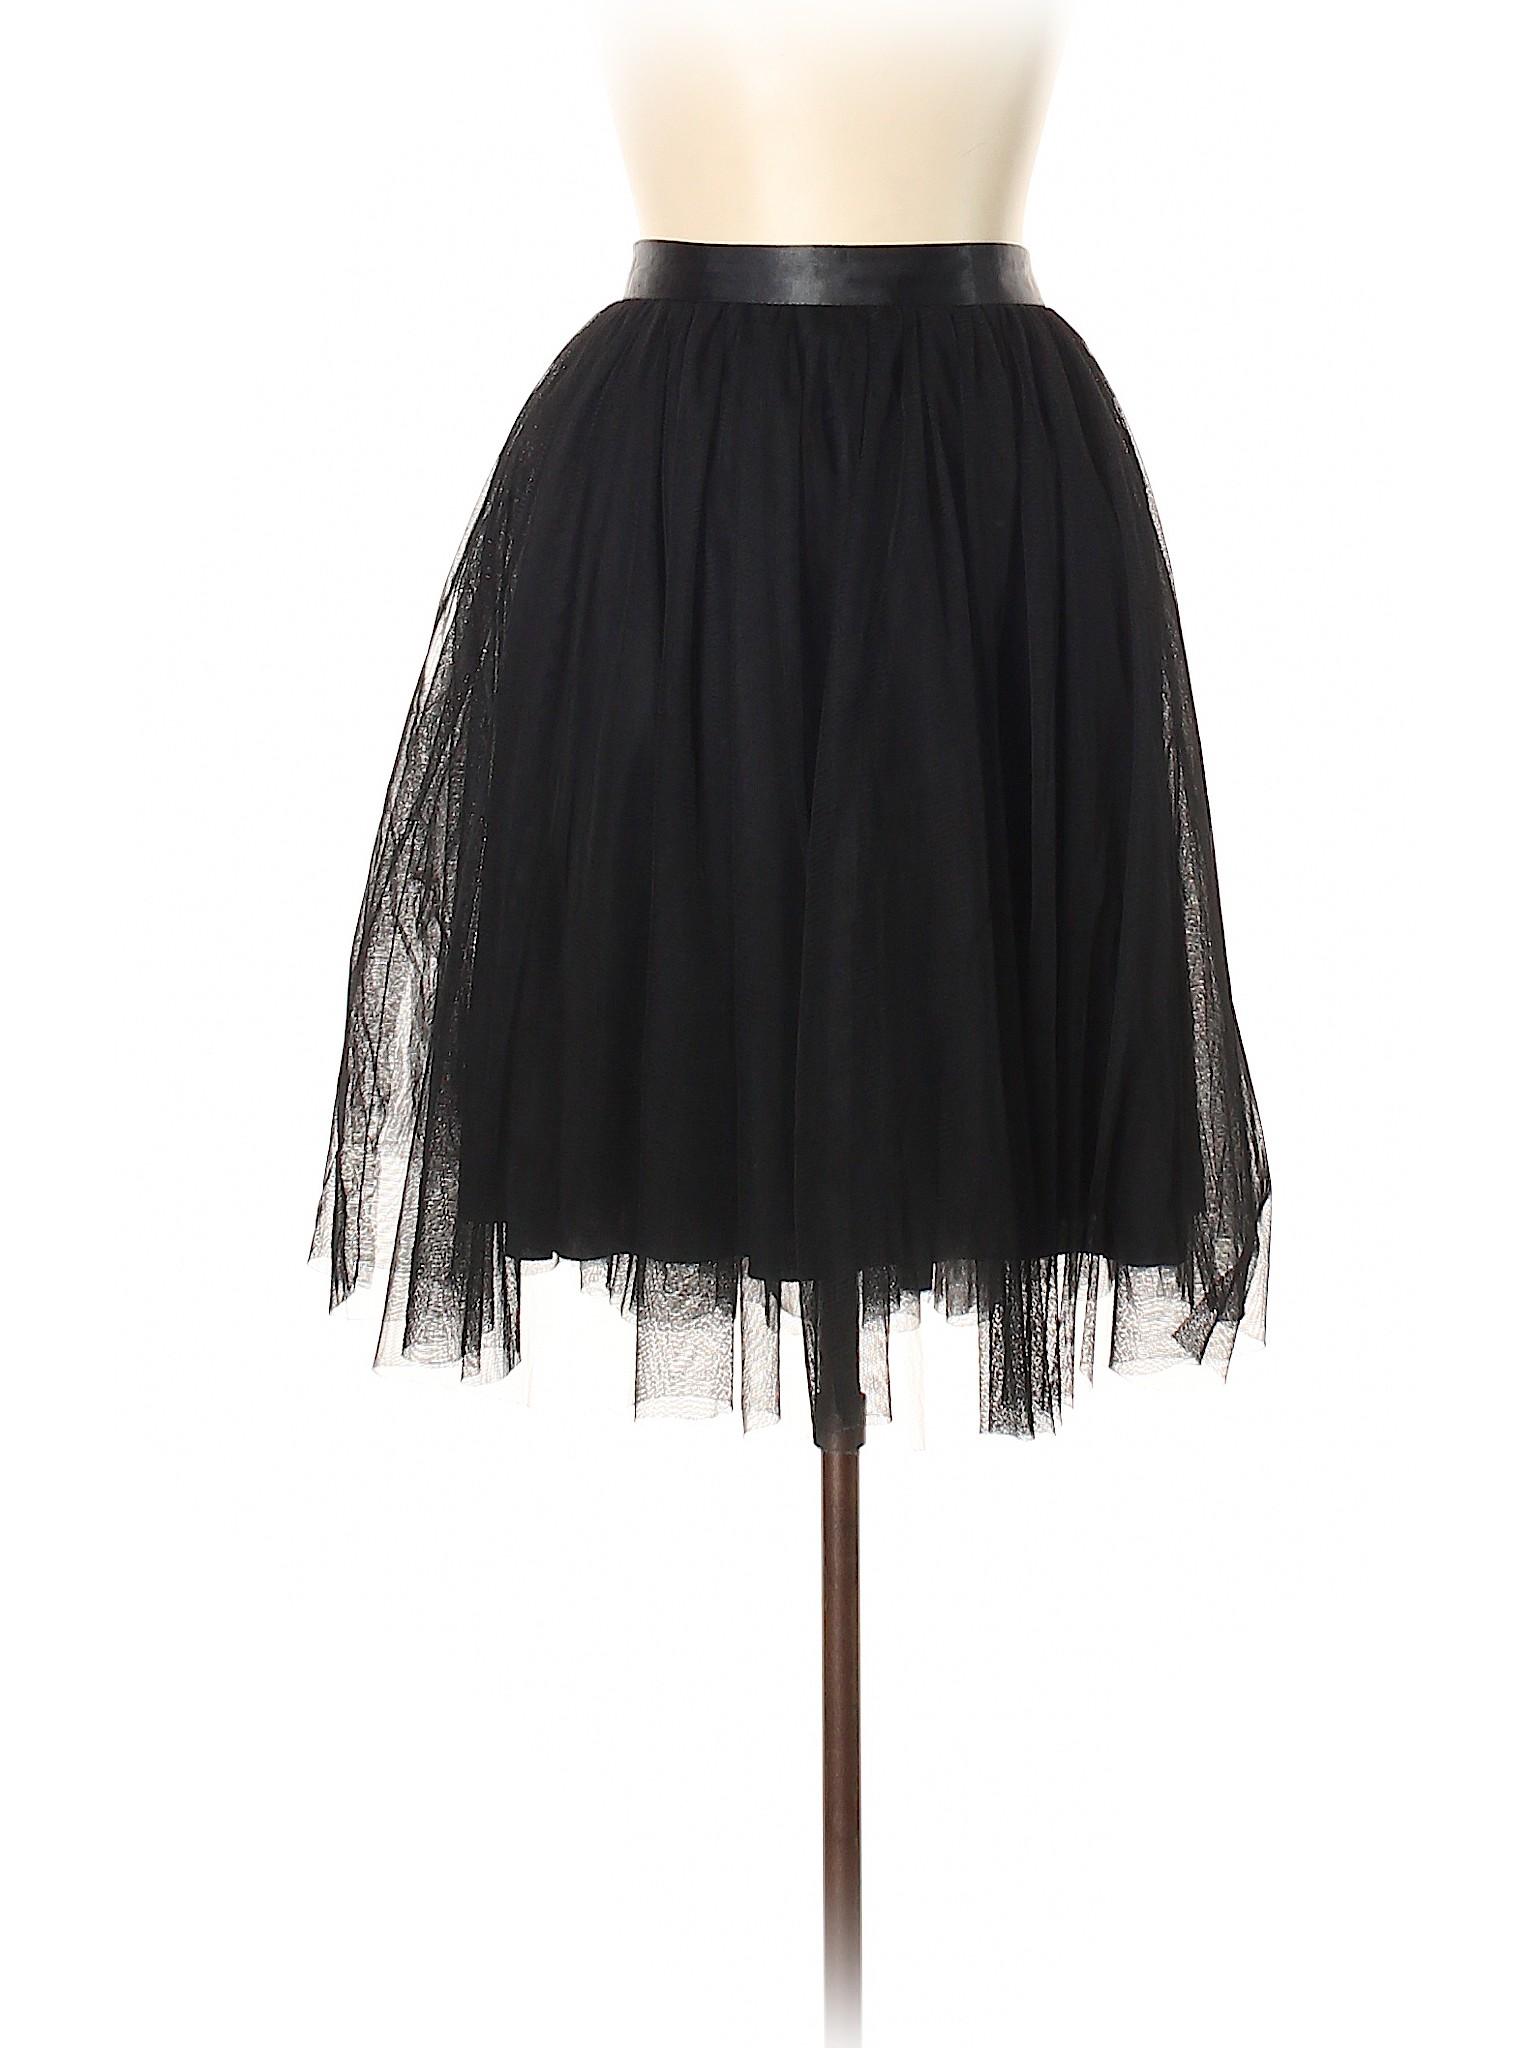 Skirt Boutique Aqua Skirt Aqua Casual Boutique Casual 6R1xxqFw